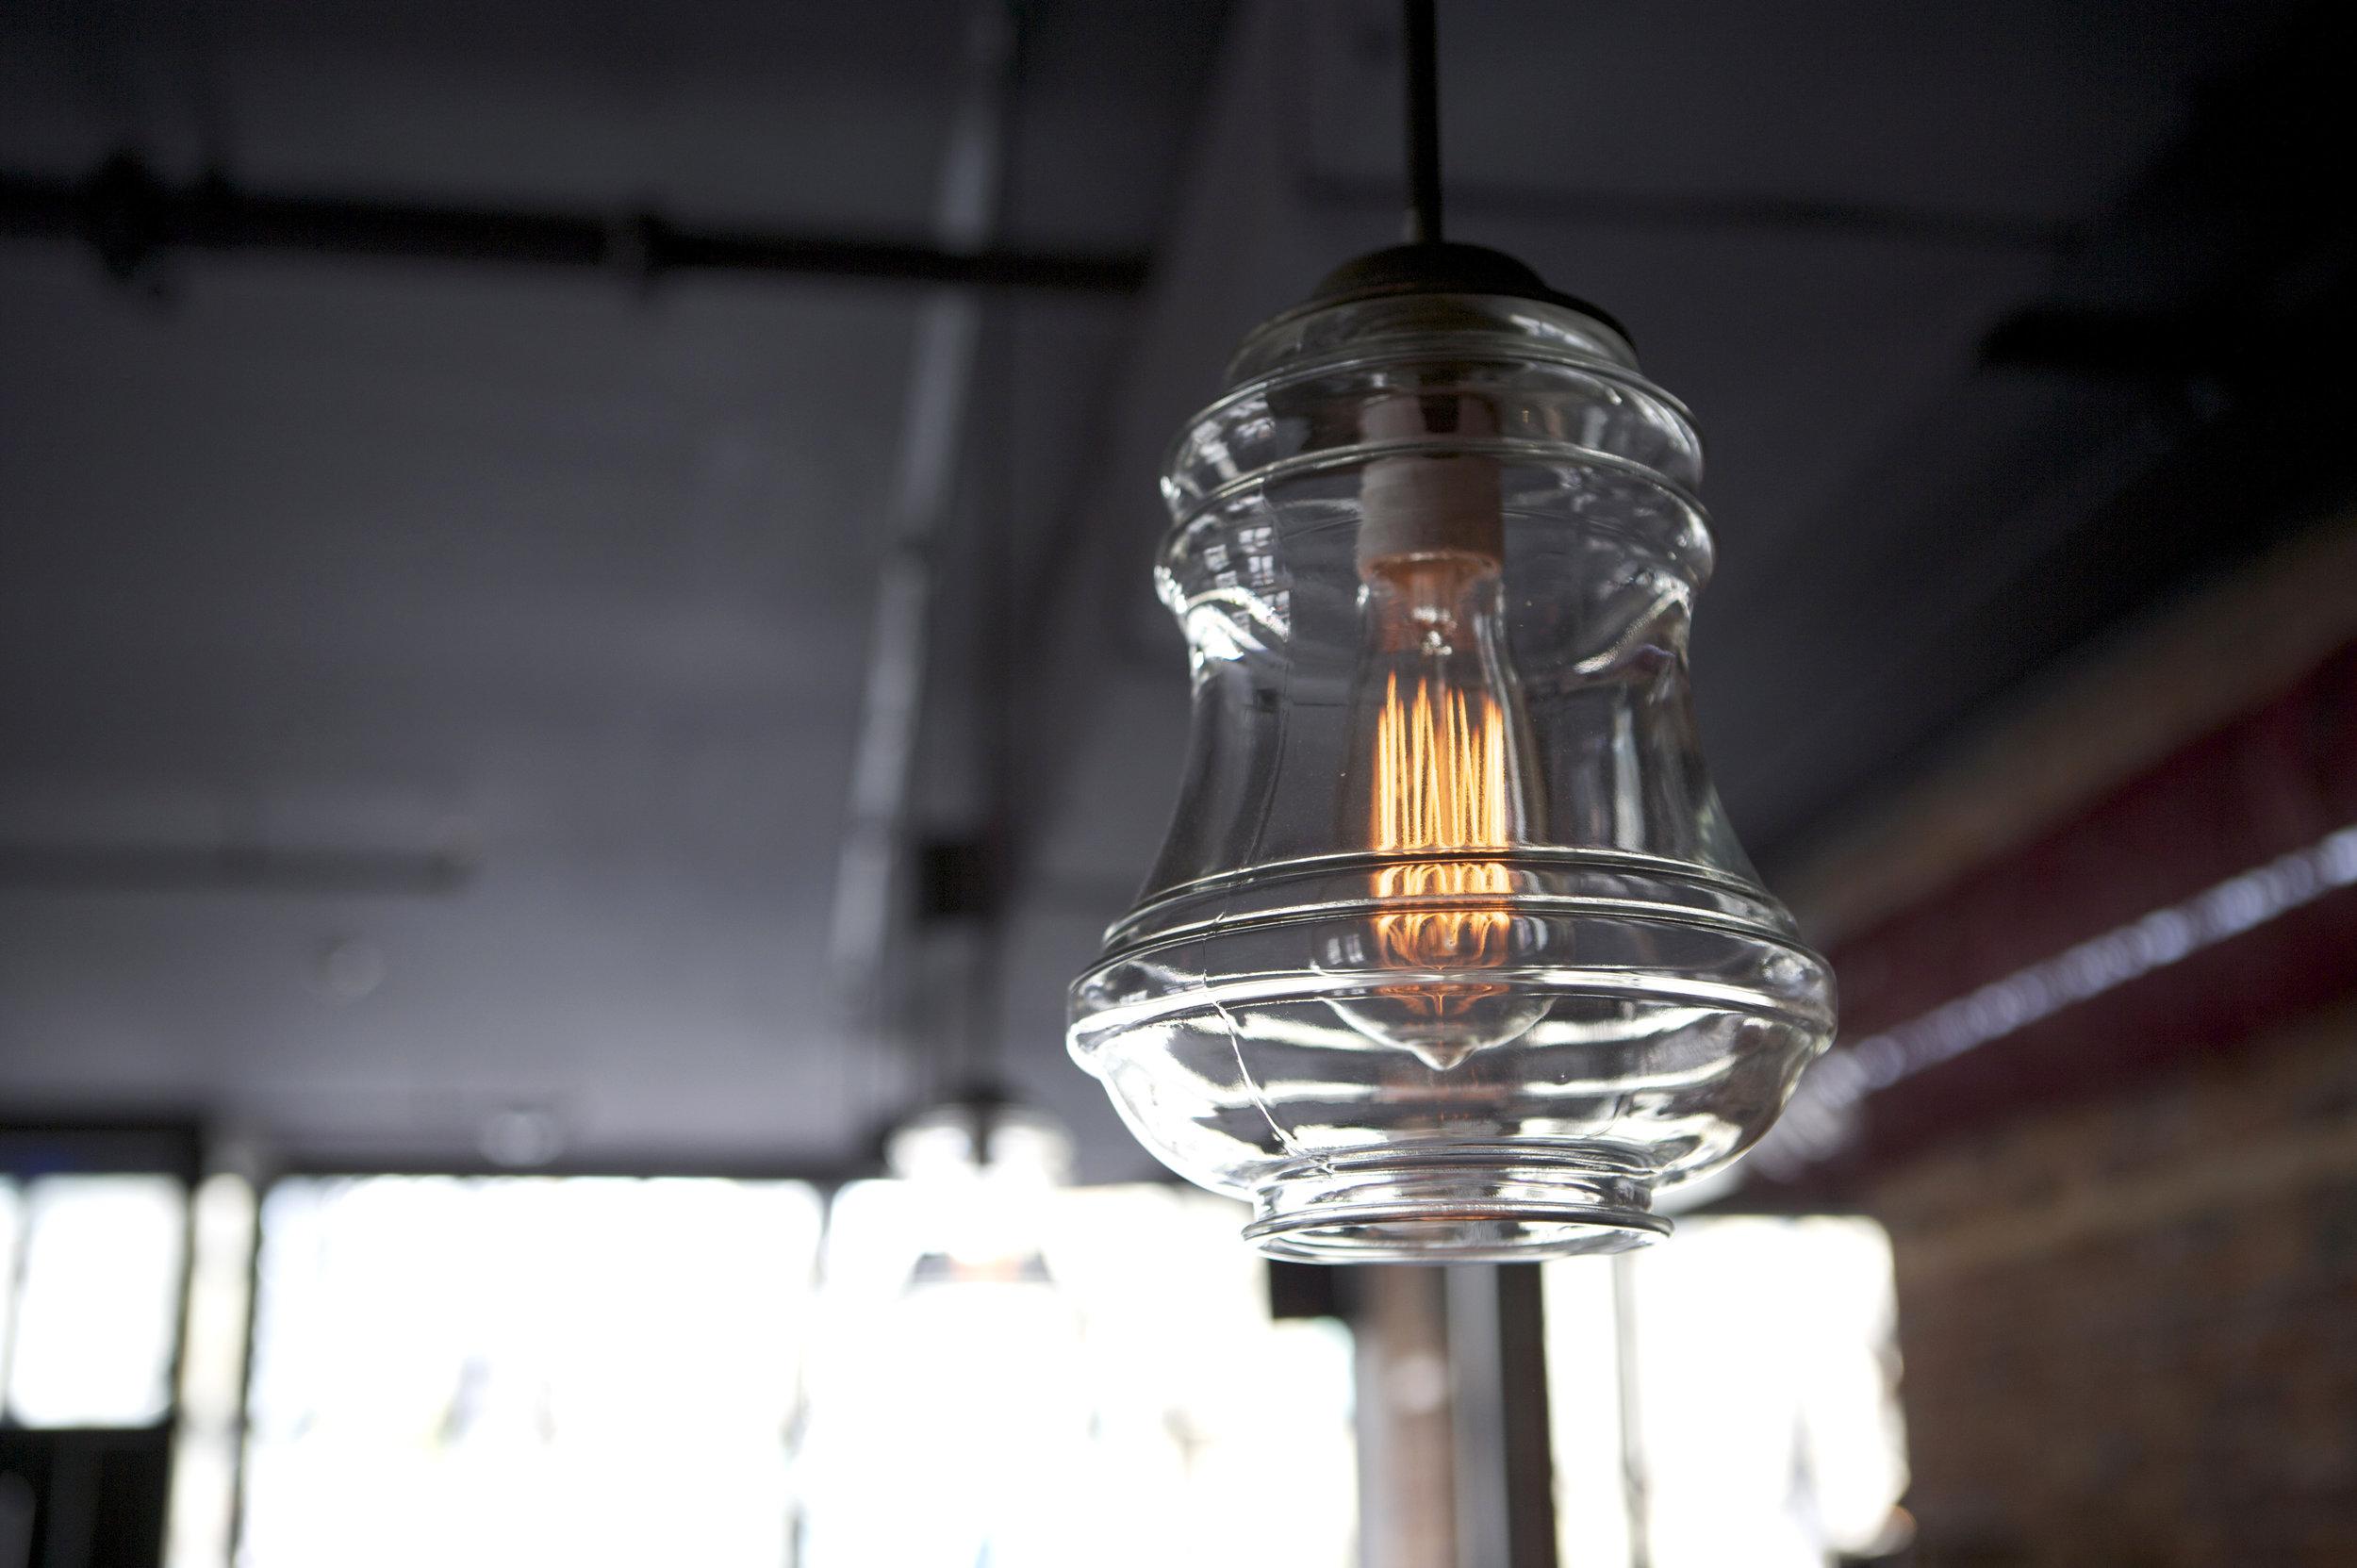 glass light copy.jpg